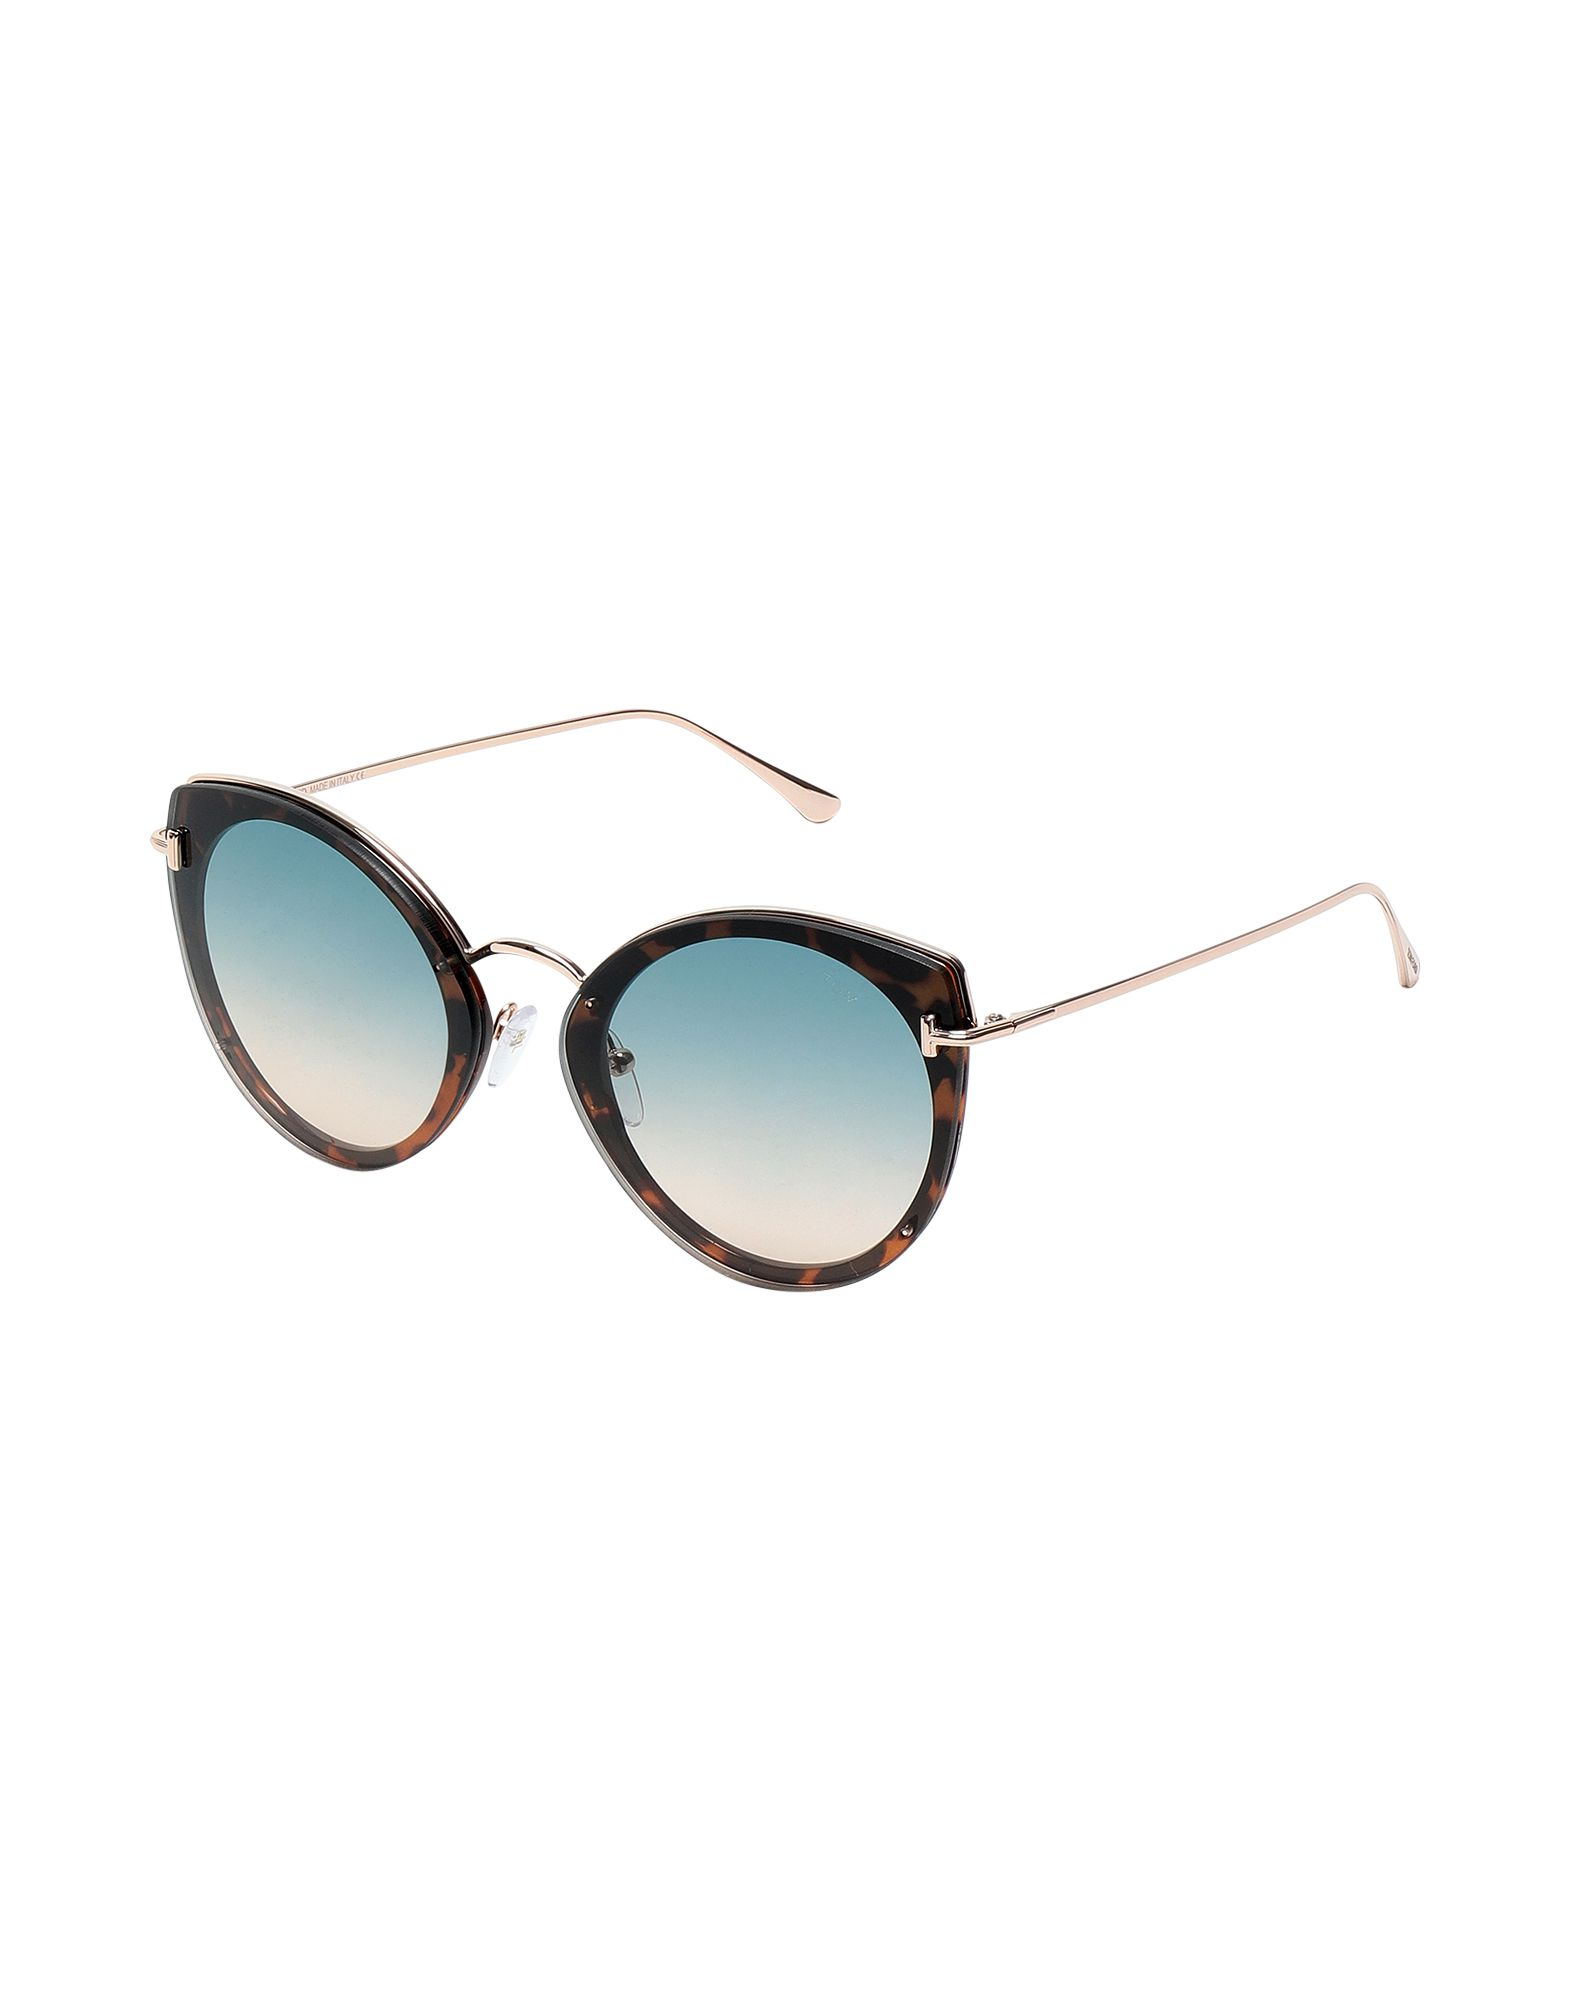 TOM FORD Sunglasses - Item 46649364